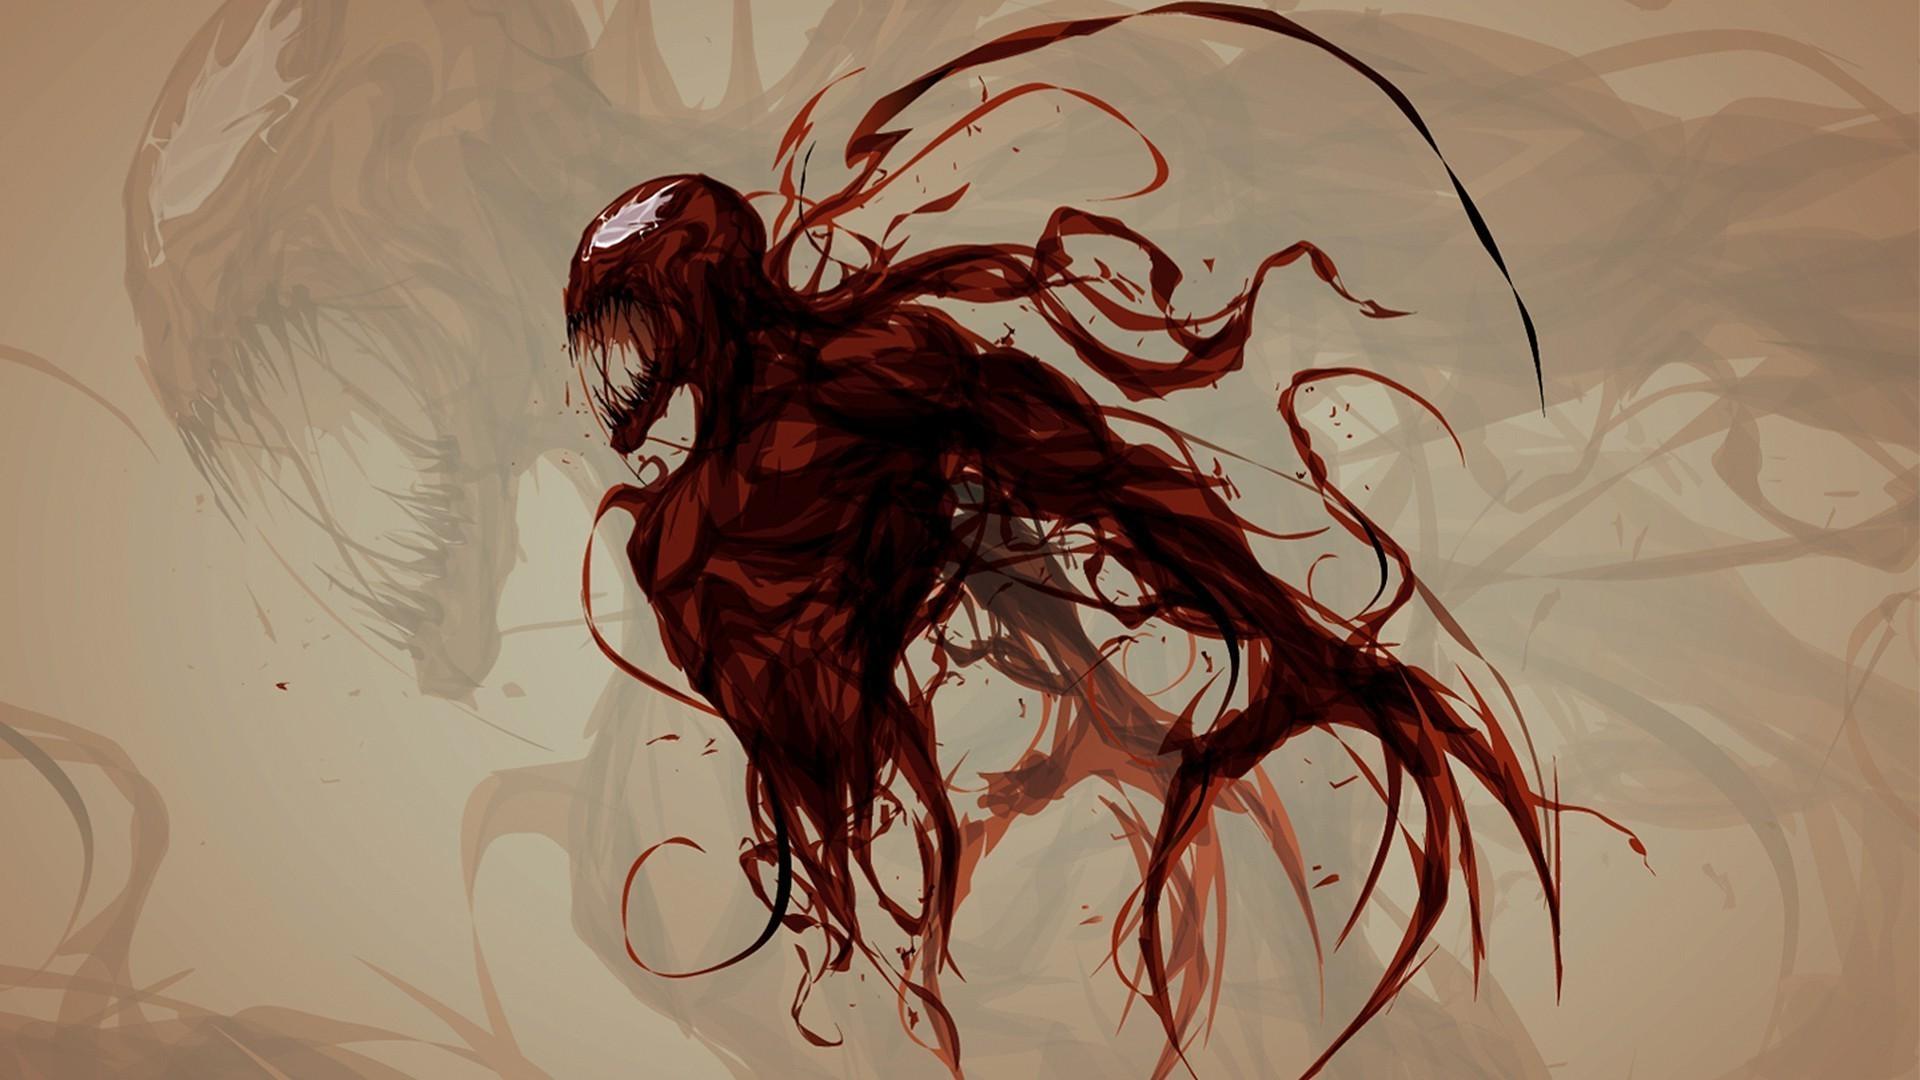 Wallpaper Painting Illustration Digital Art Red Movies Paint Splatter Spider Man Art Sketch 1920x1080 Px Human Body Fictional Character Organ Figure Drawing 1920x1080 Wallhaven 617336 Hd Wallpapers Wallhere